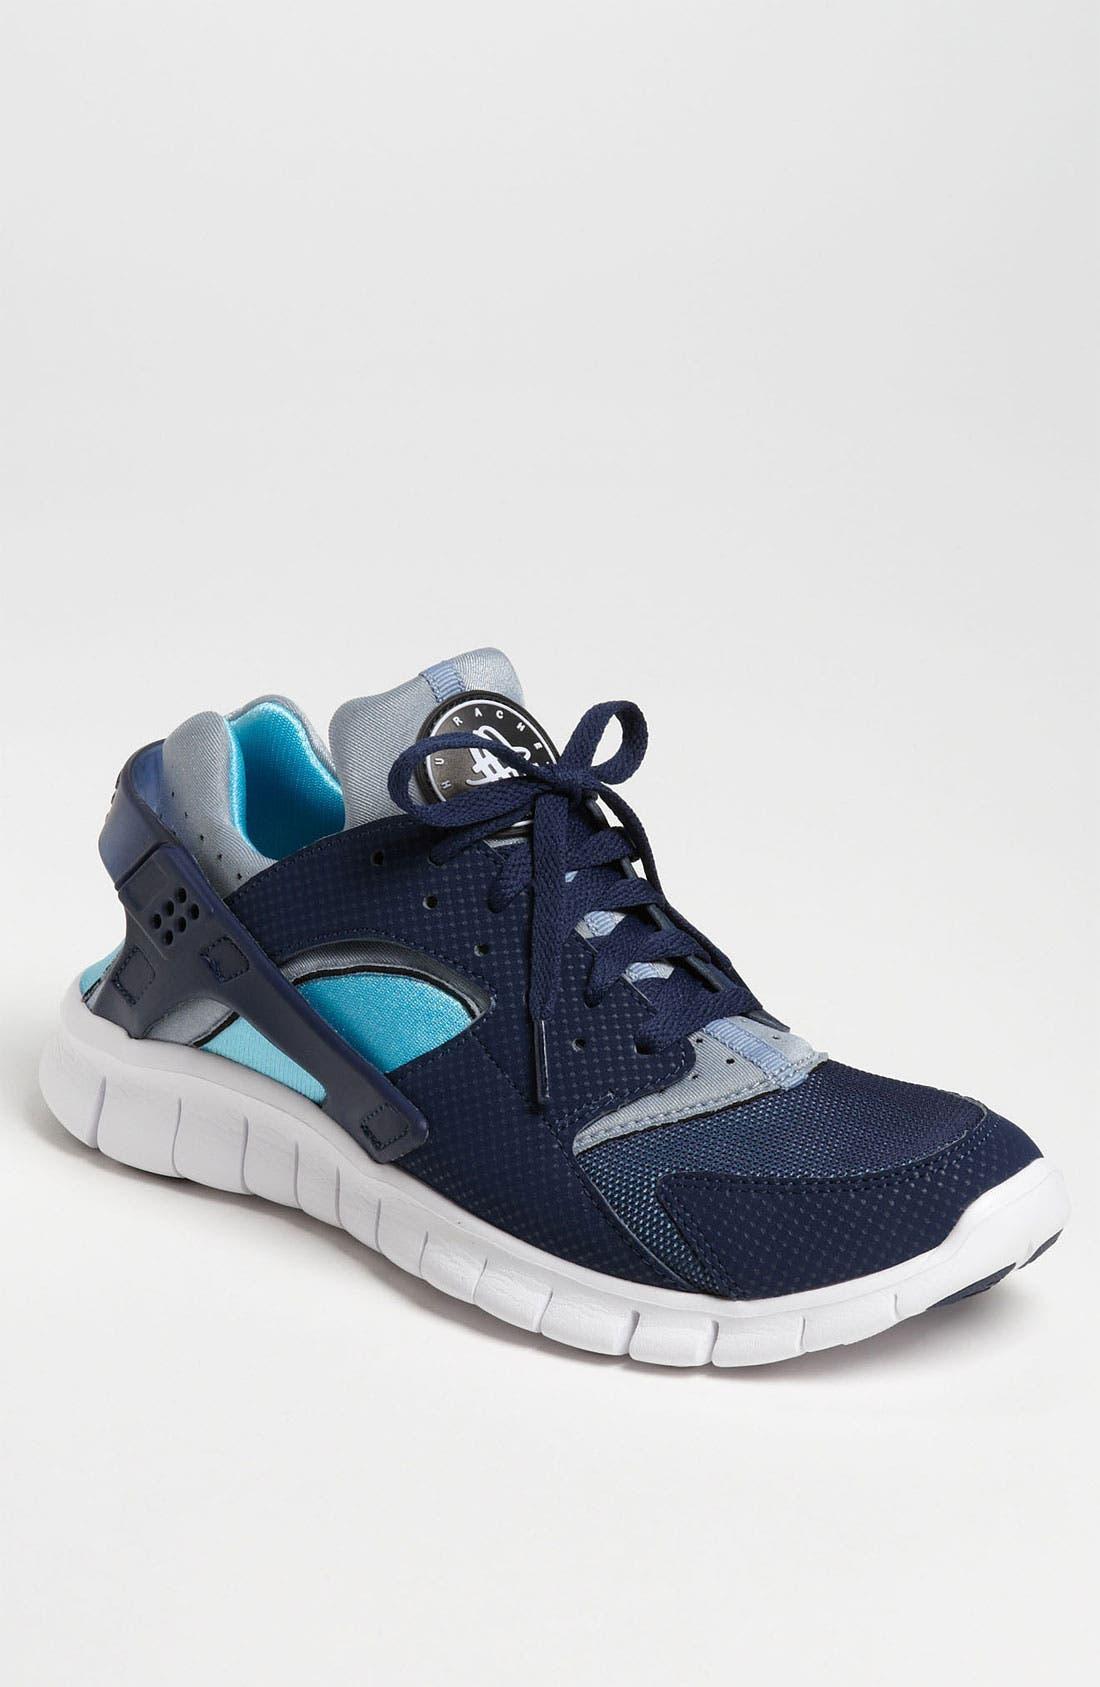 Alternate Image 1 Selected - Nike 'Huarache Free Run' Running Shoe (Men)